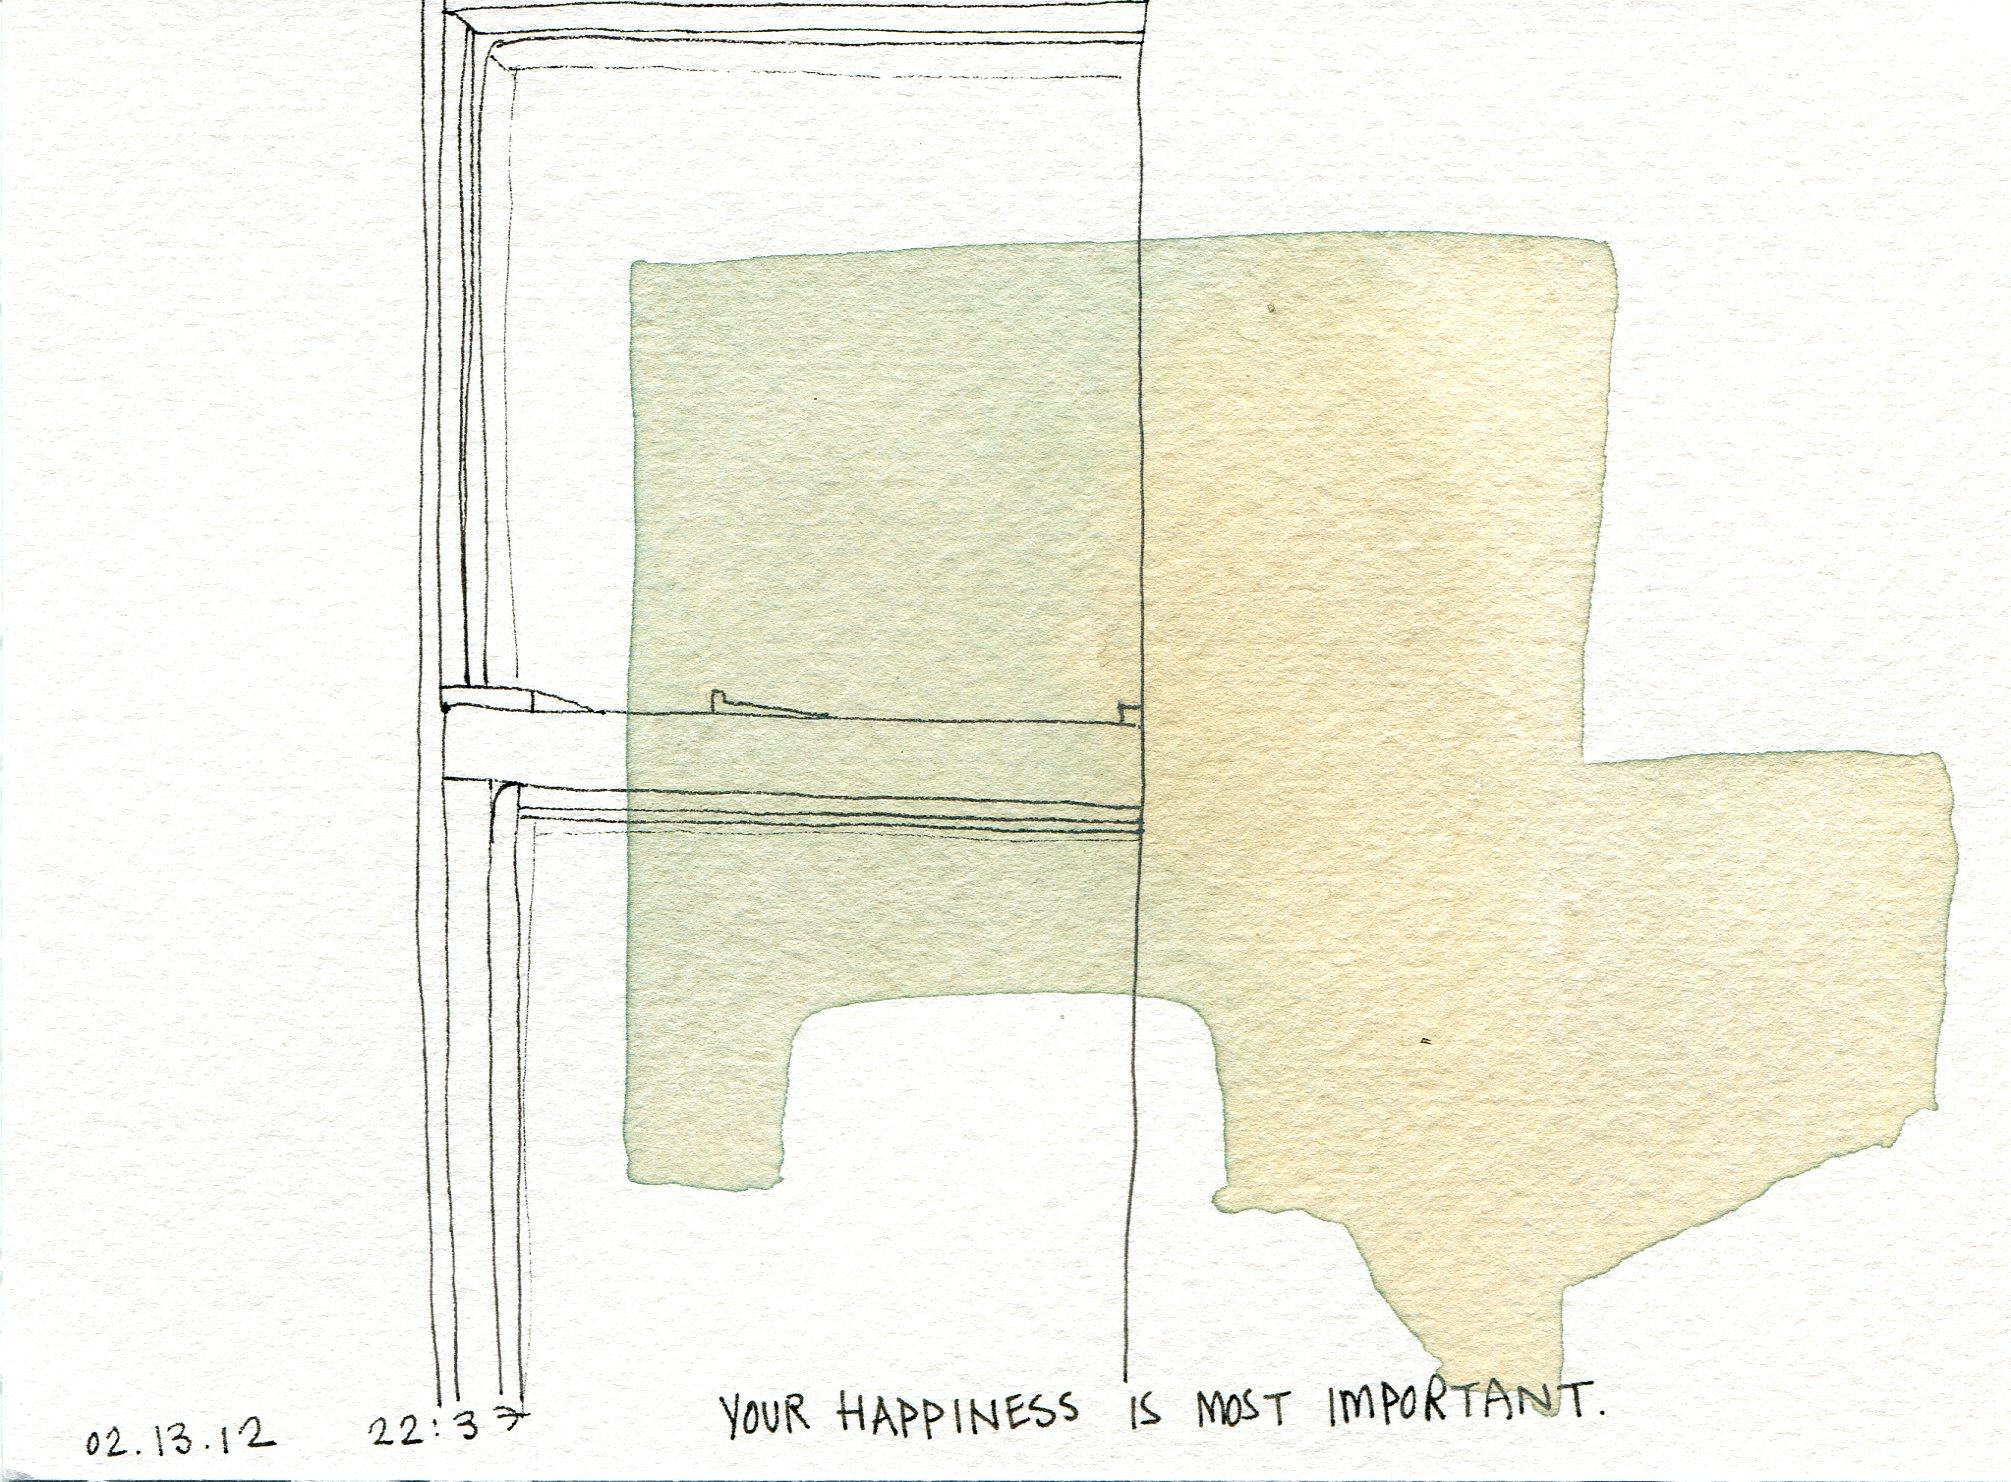 2012-02-17 drawing004.jpg